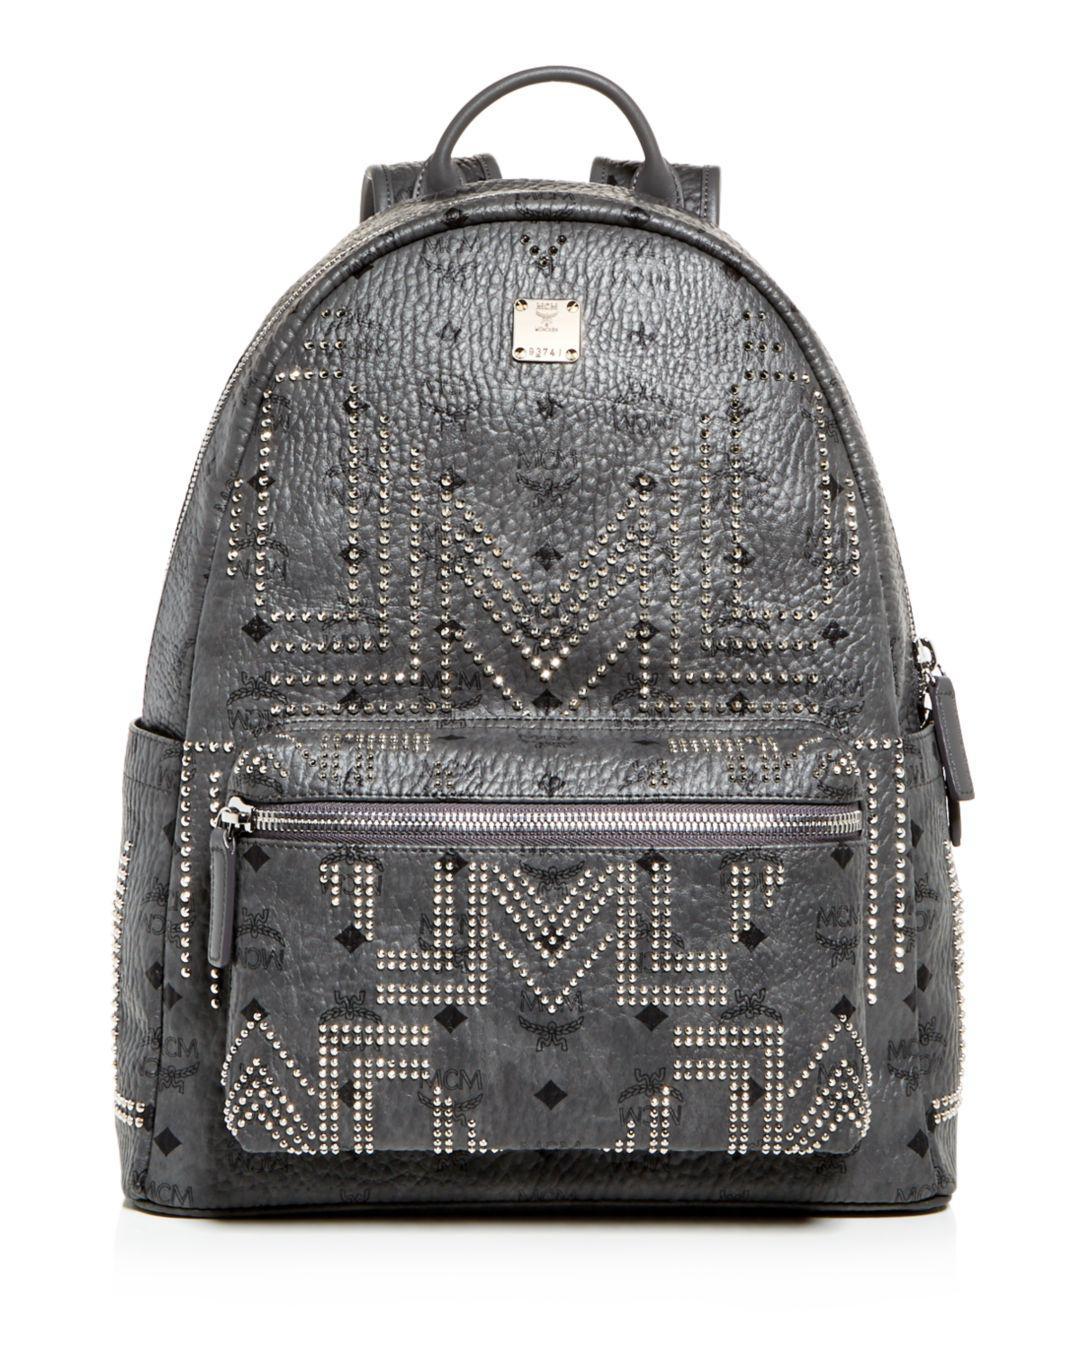 557ff4f5a6054 MCM Stark Gunta Medium Studded Backpack in Gray for Men - Lyst